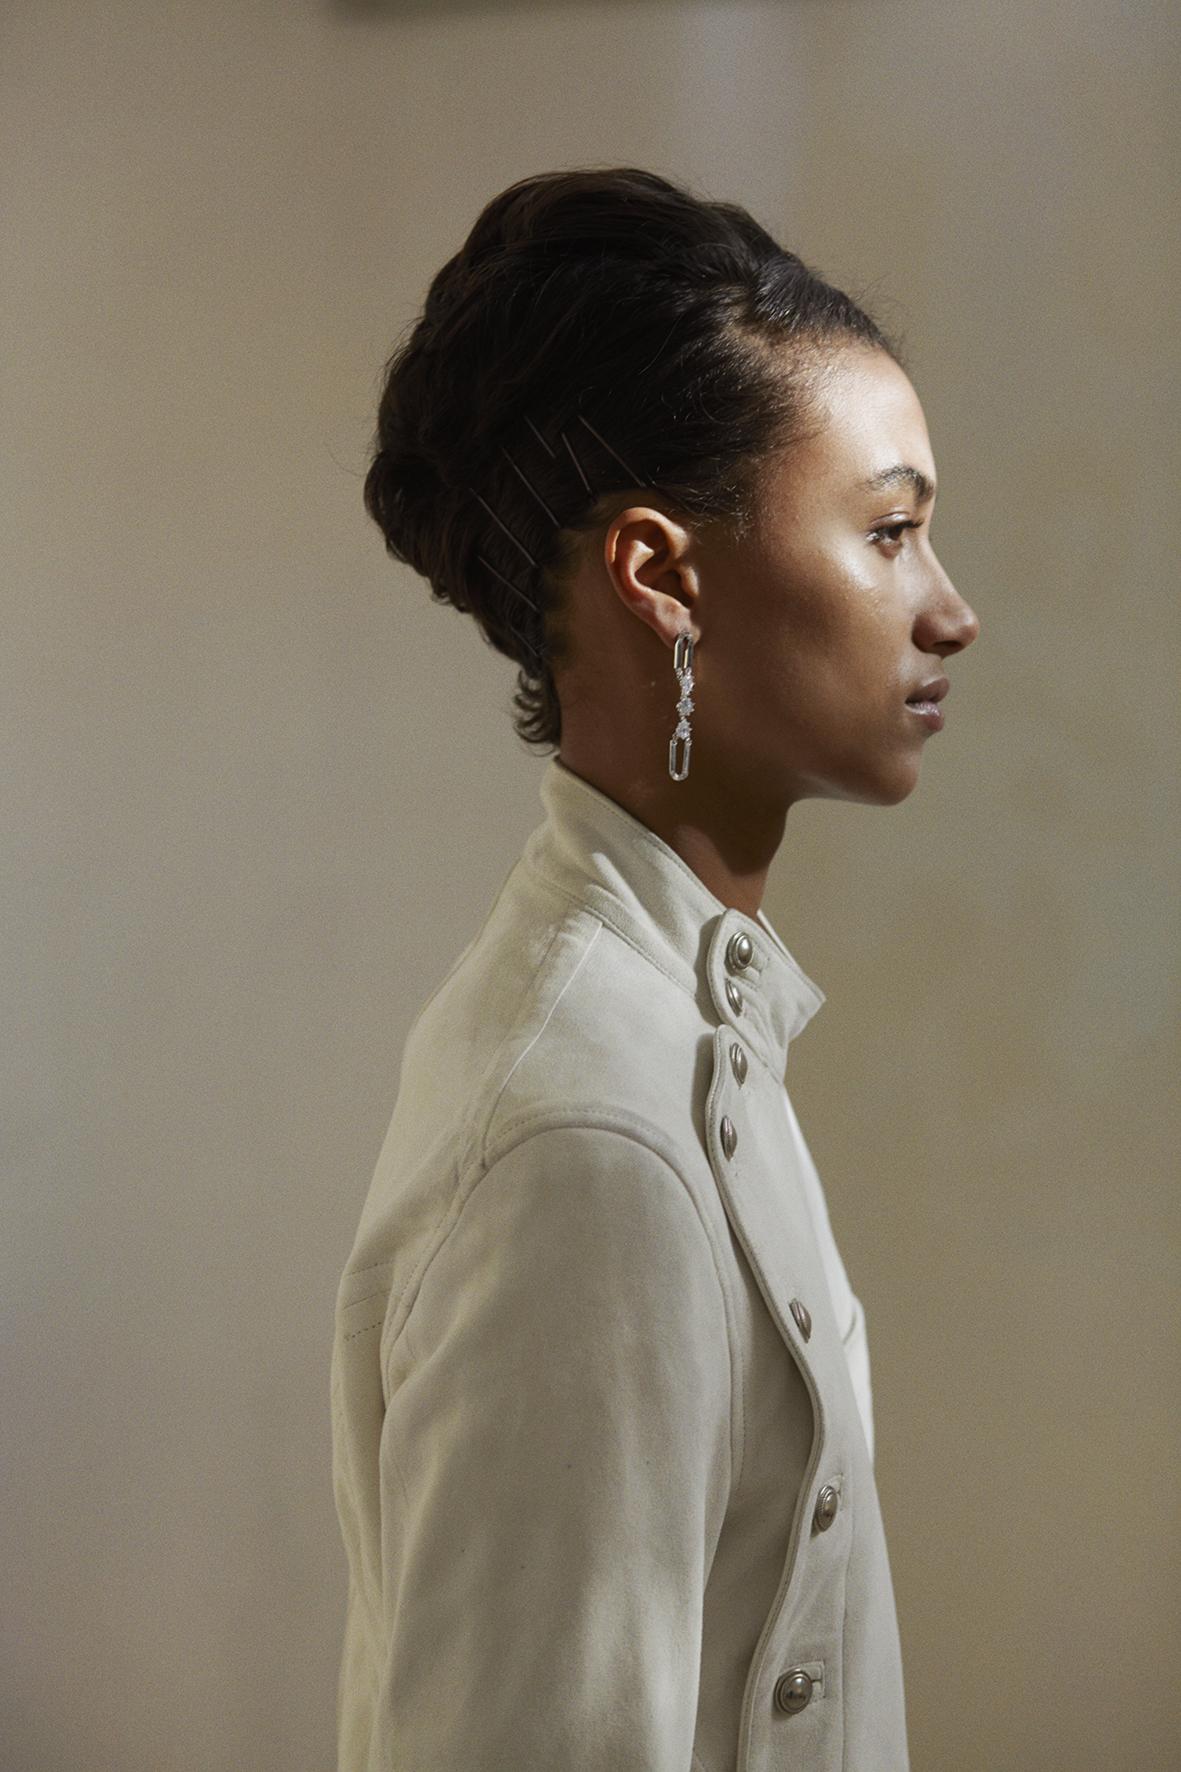 Fencing leather jacket. Hand-cut crystals silver earrings EDDIE BORGO